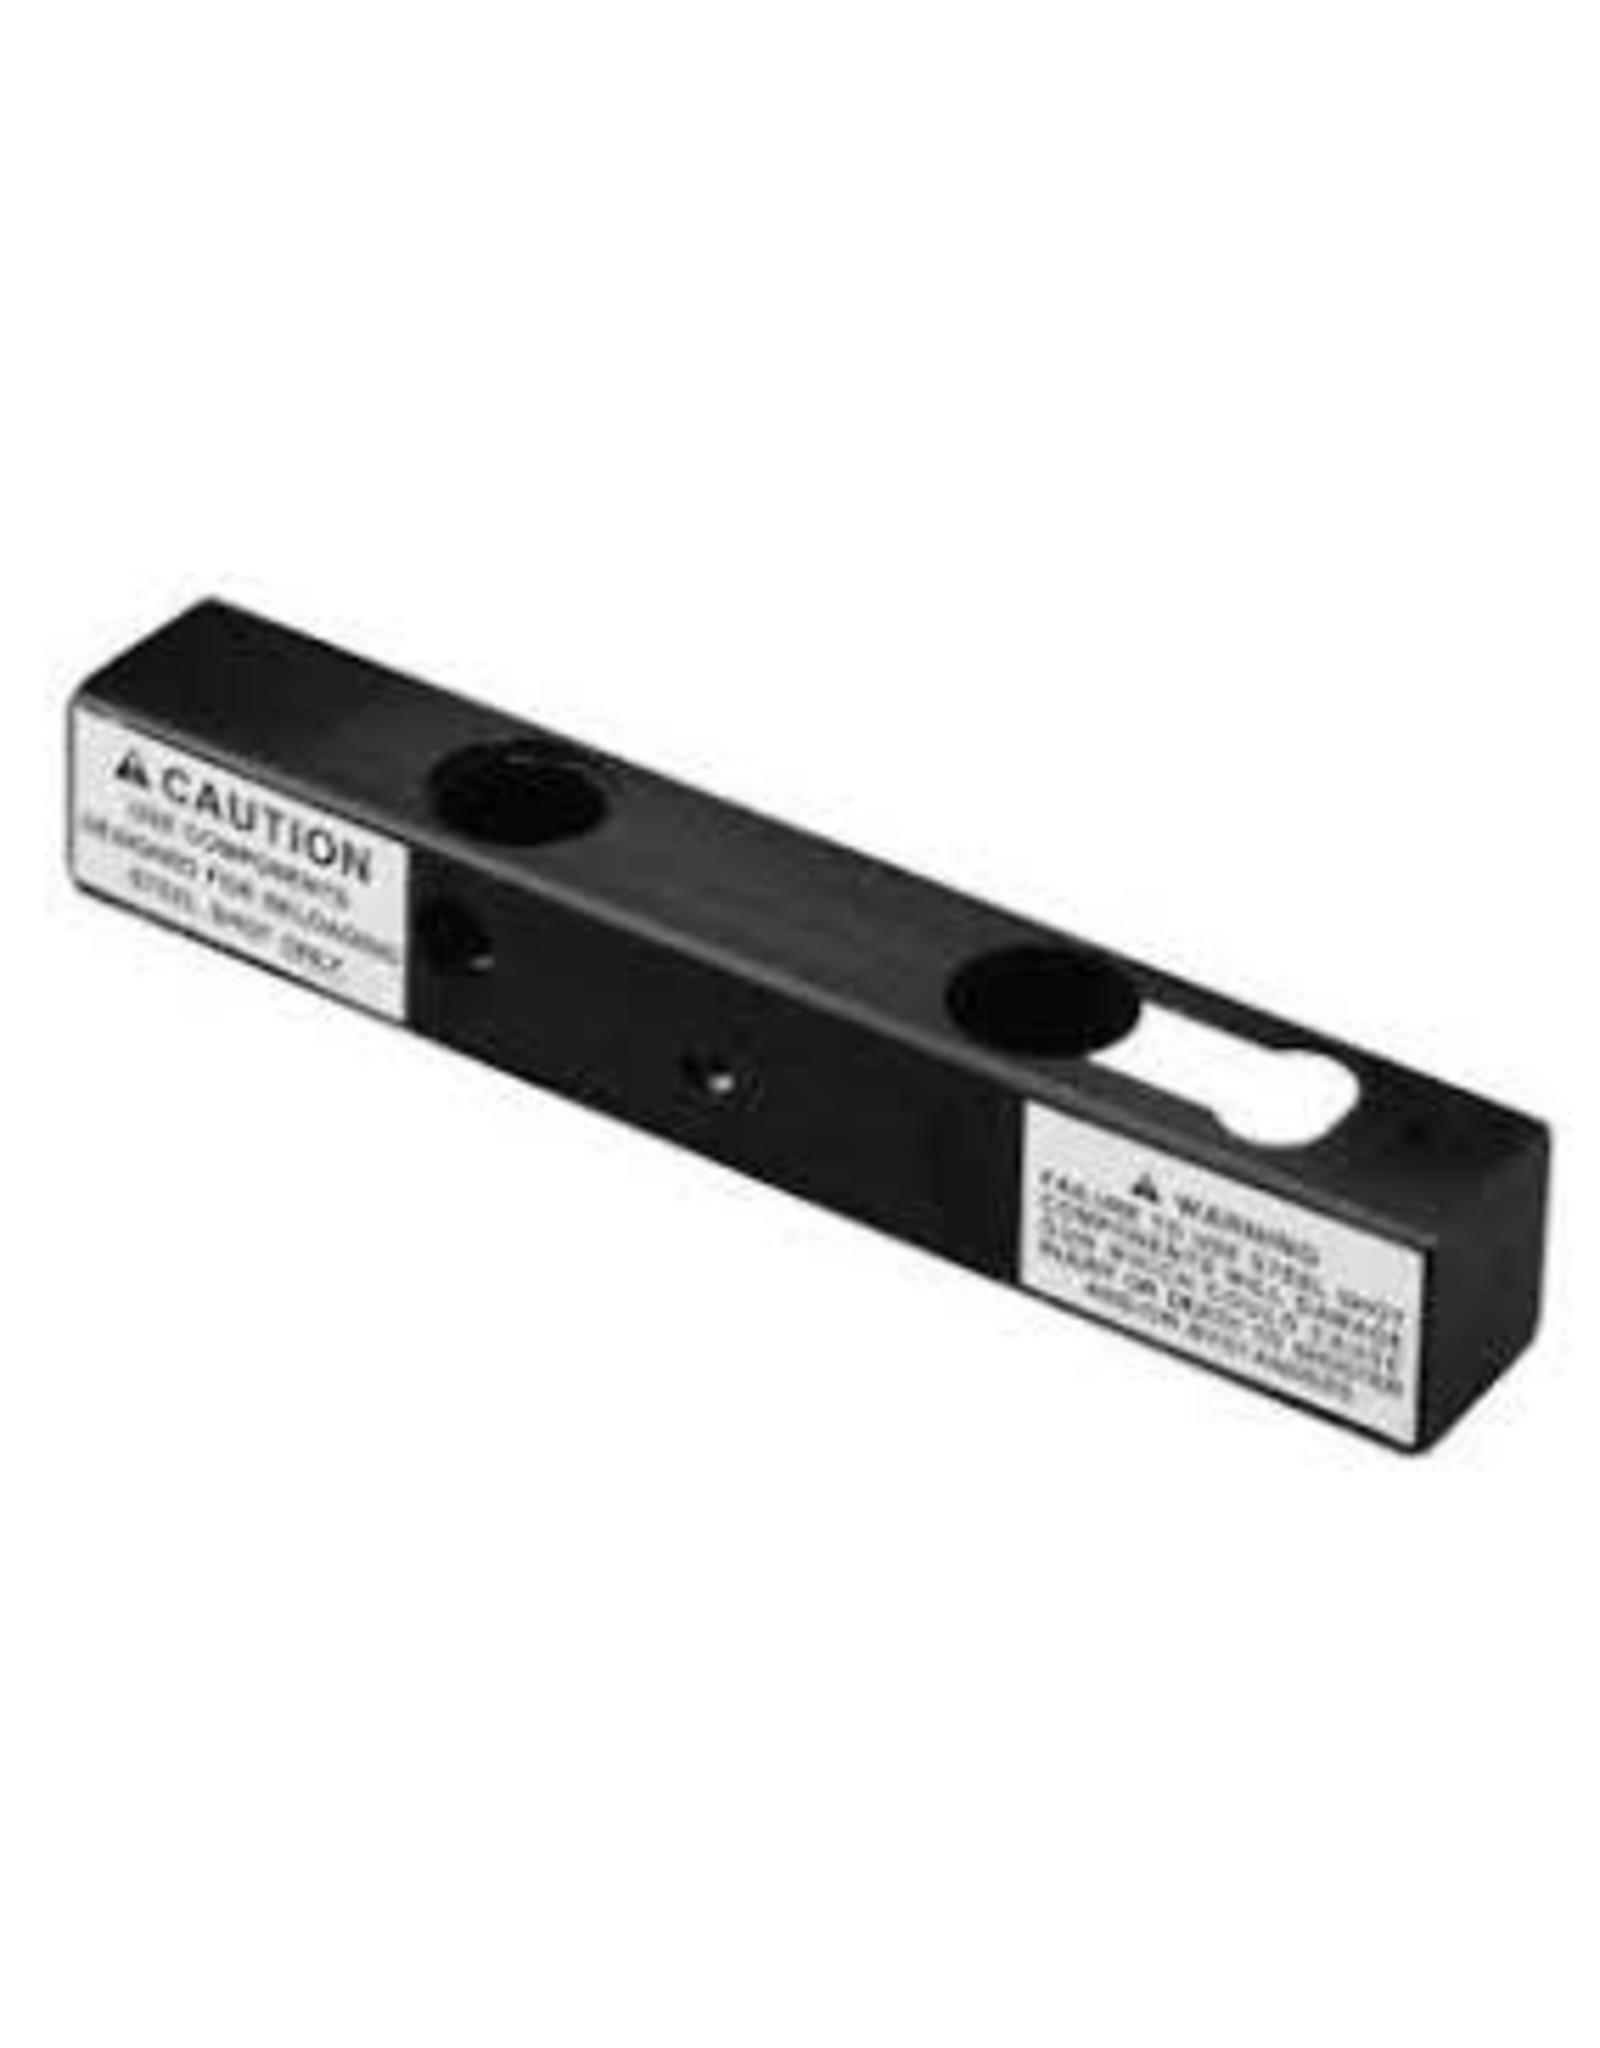 MEC MEC Steel Charge Bar BB - #2